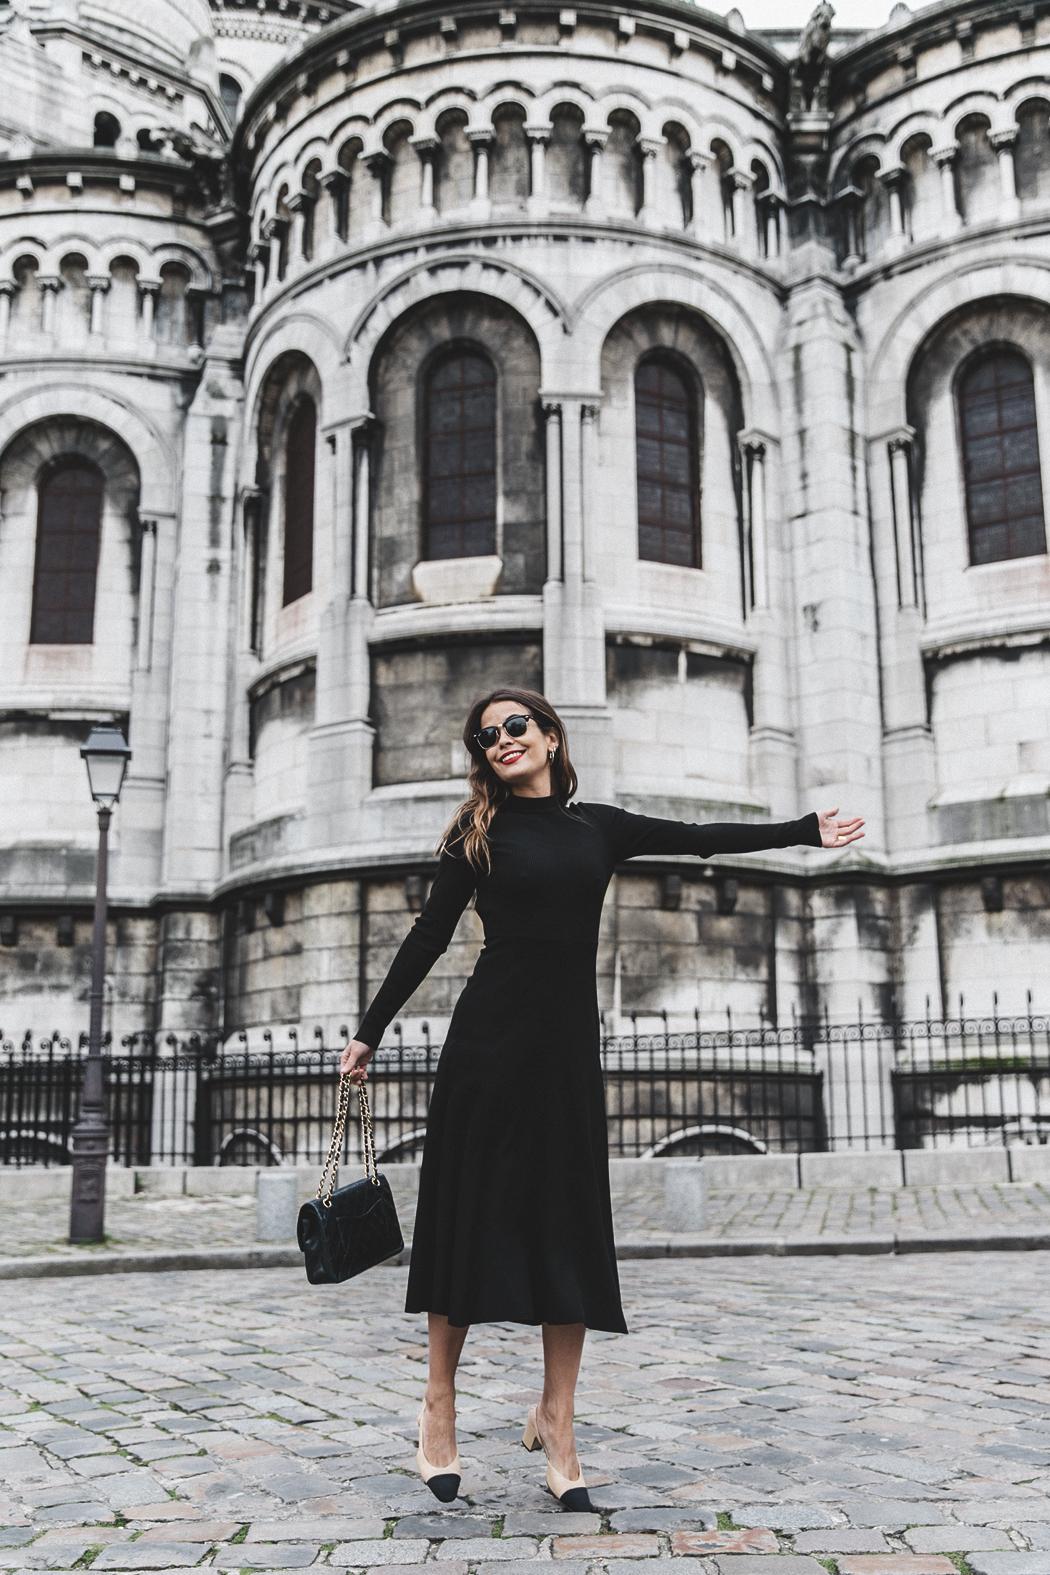 Backless_Dress-Black_Dress-Chanel_Shoes-Paris-PFW-Paris_Fashion_Week_Fall_2016-62